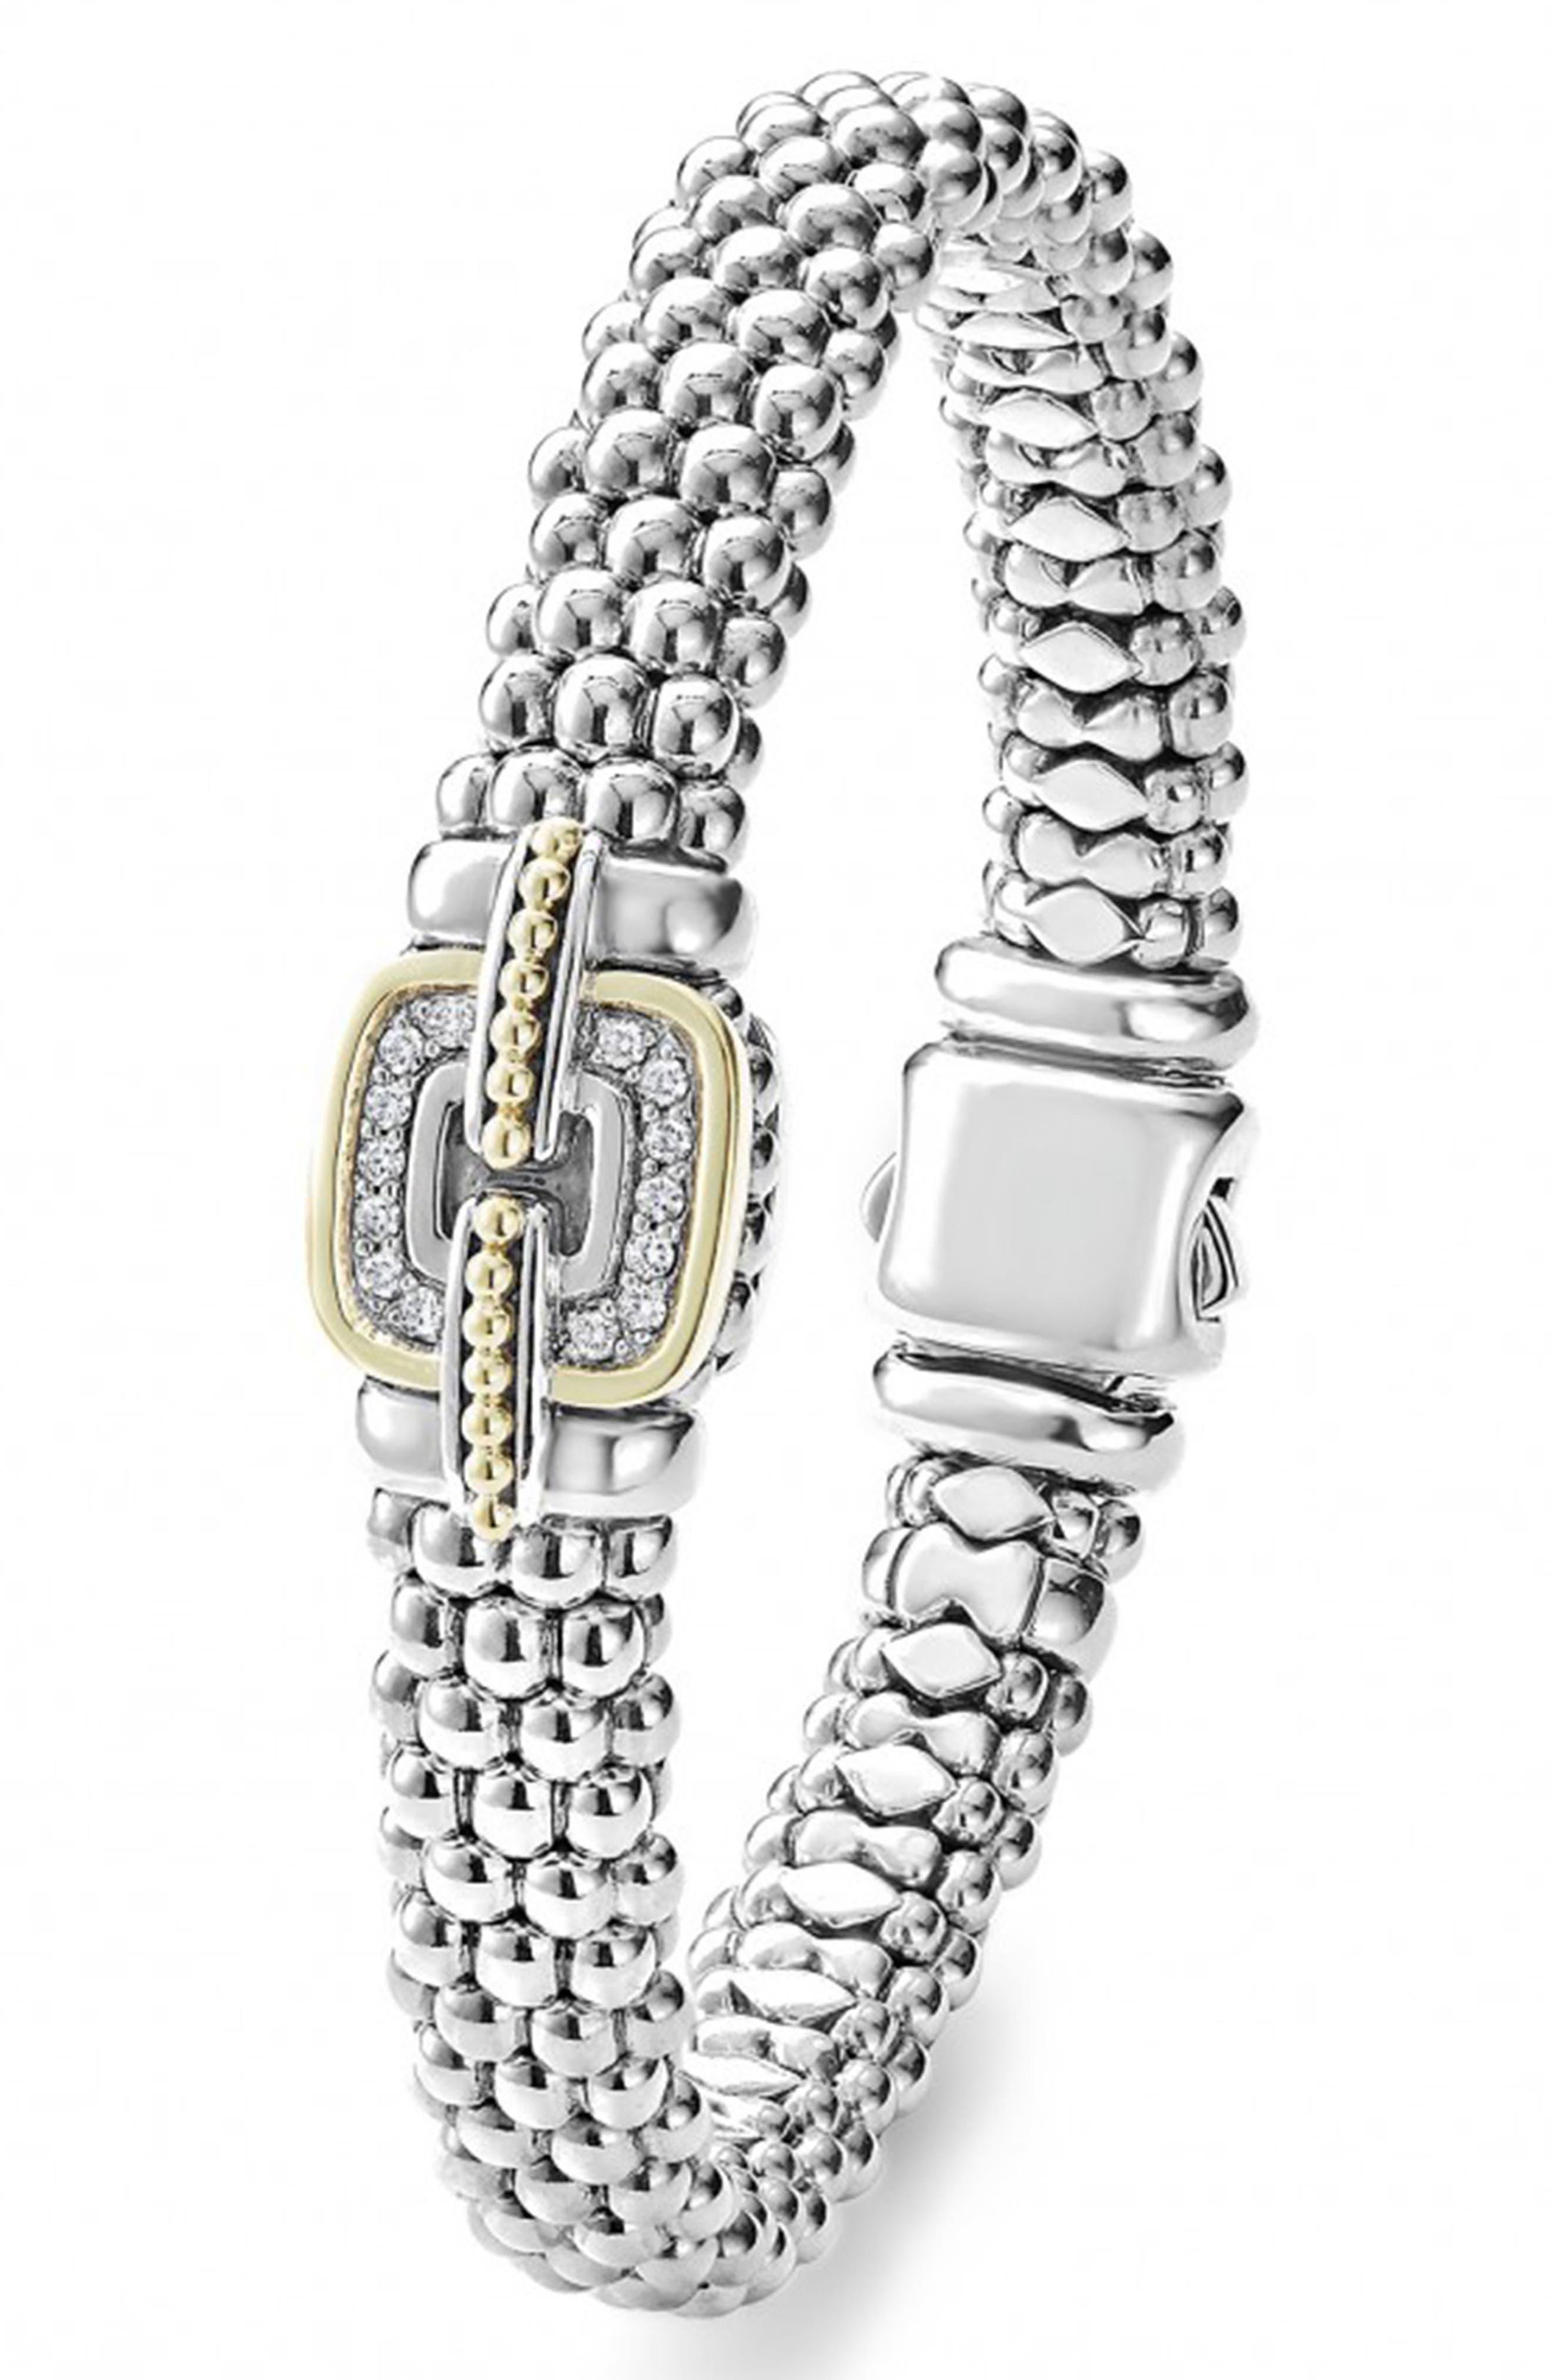 Cushion Caviar Bracelet,                             Alternate thumbnail 4, color,                             SILVER/ GOLD